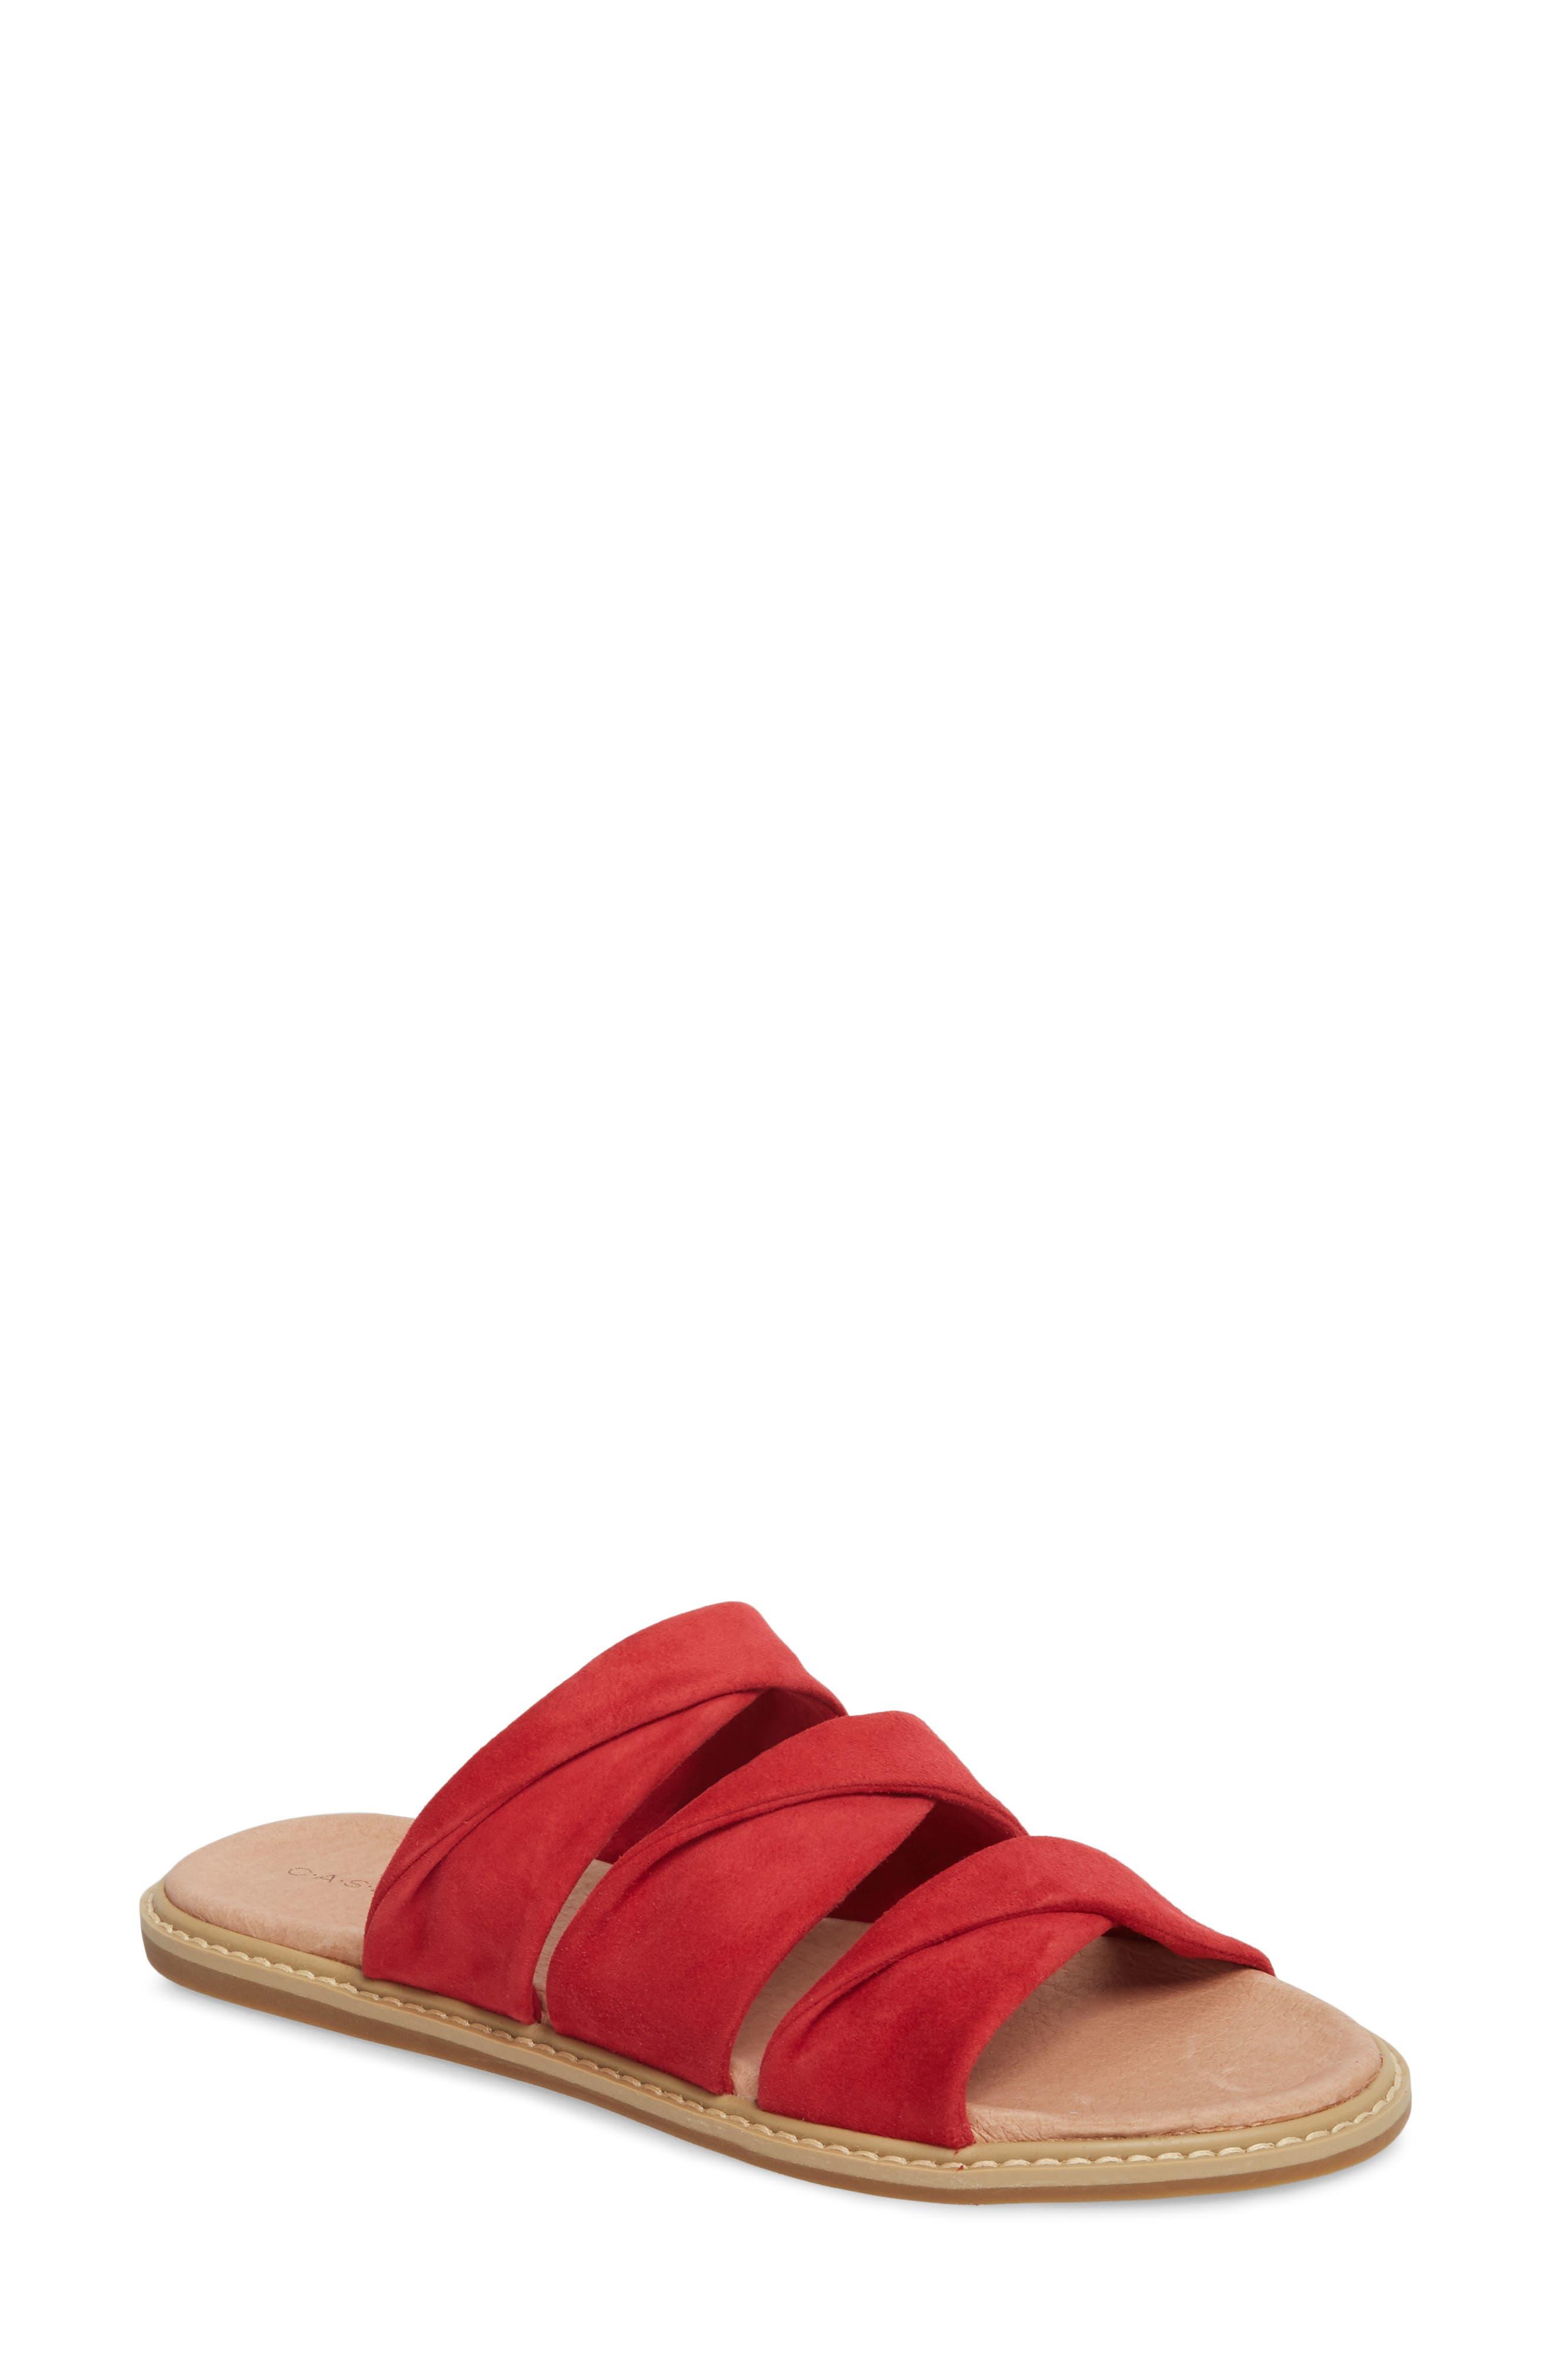 Cooper Slide Sandal,                             Main thumbnail 4, color,